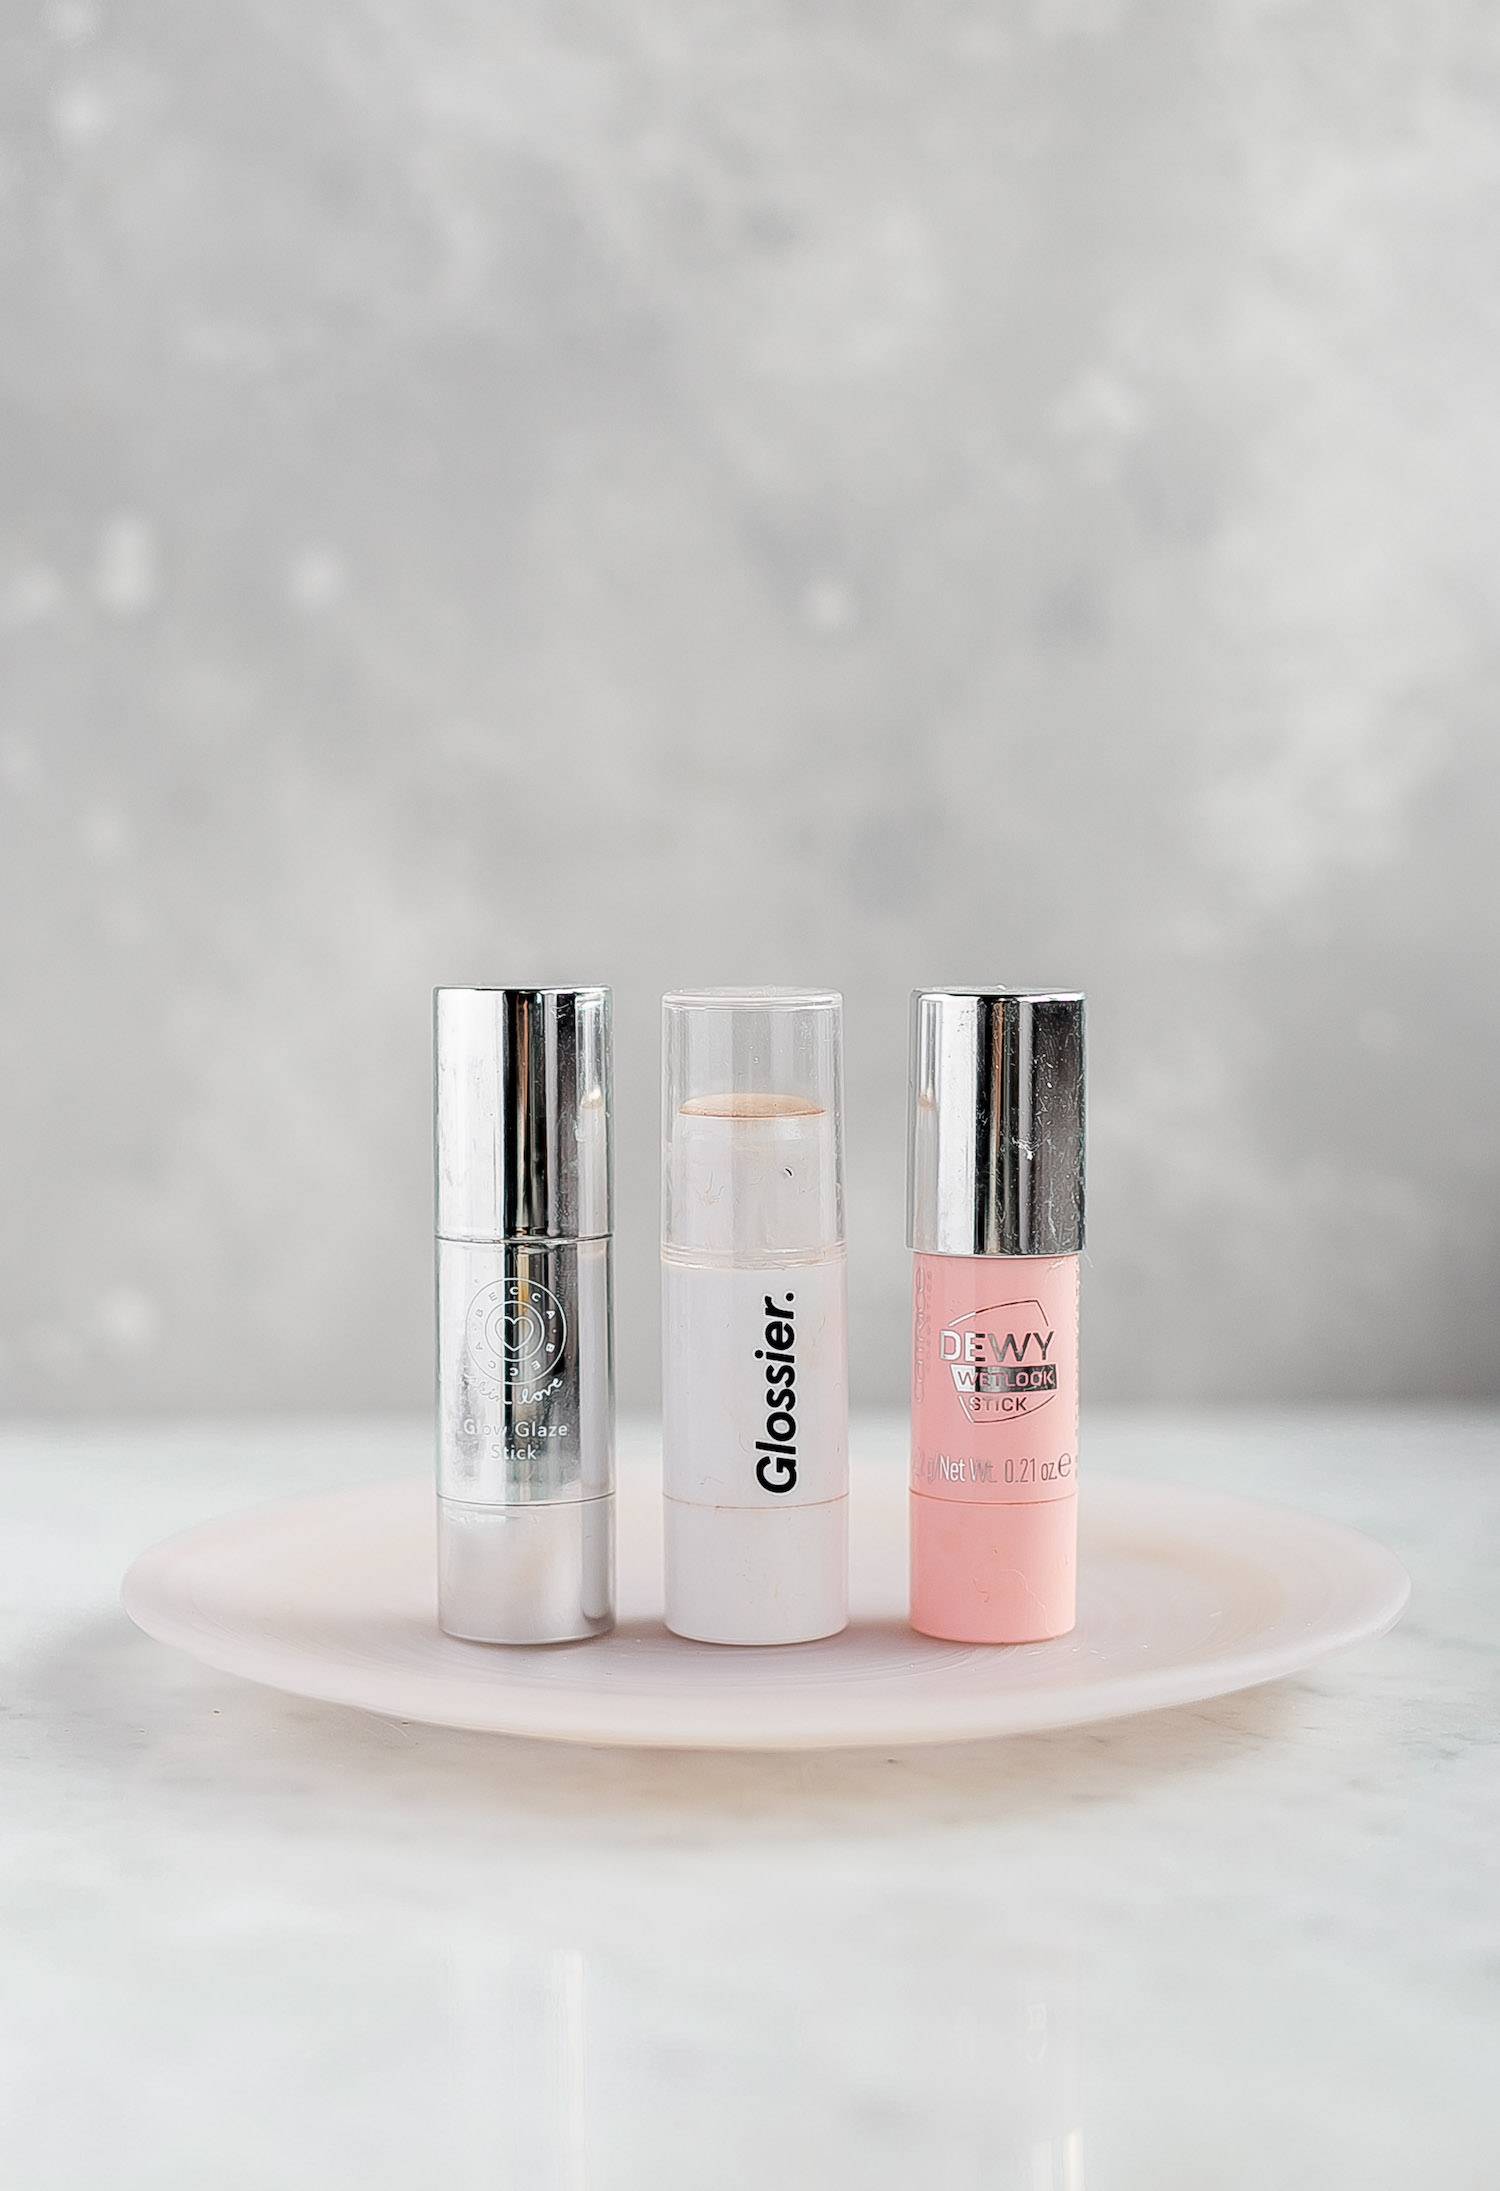 New Favorite Makeup Purchases   TrufflesandTrends.com